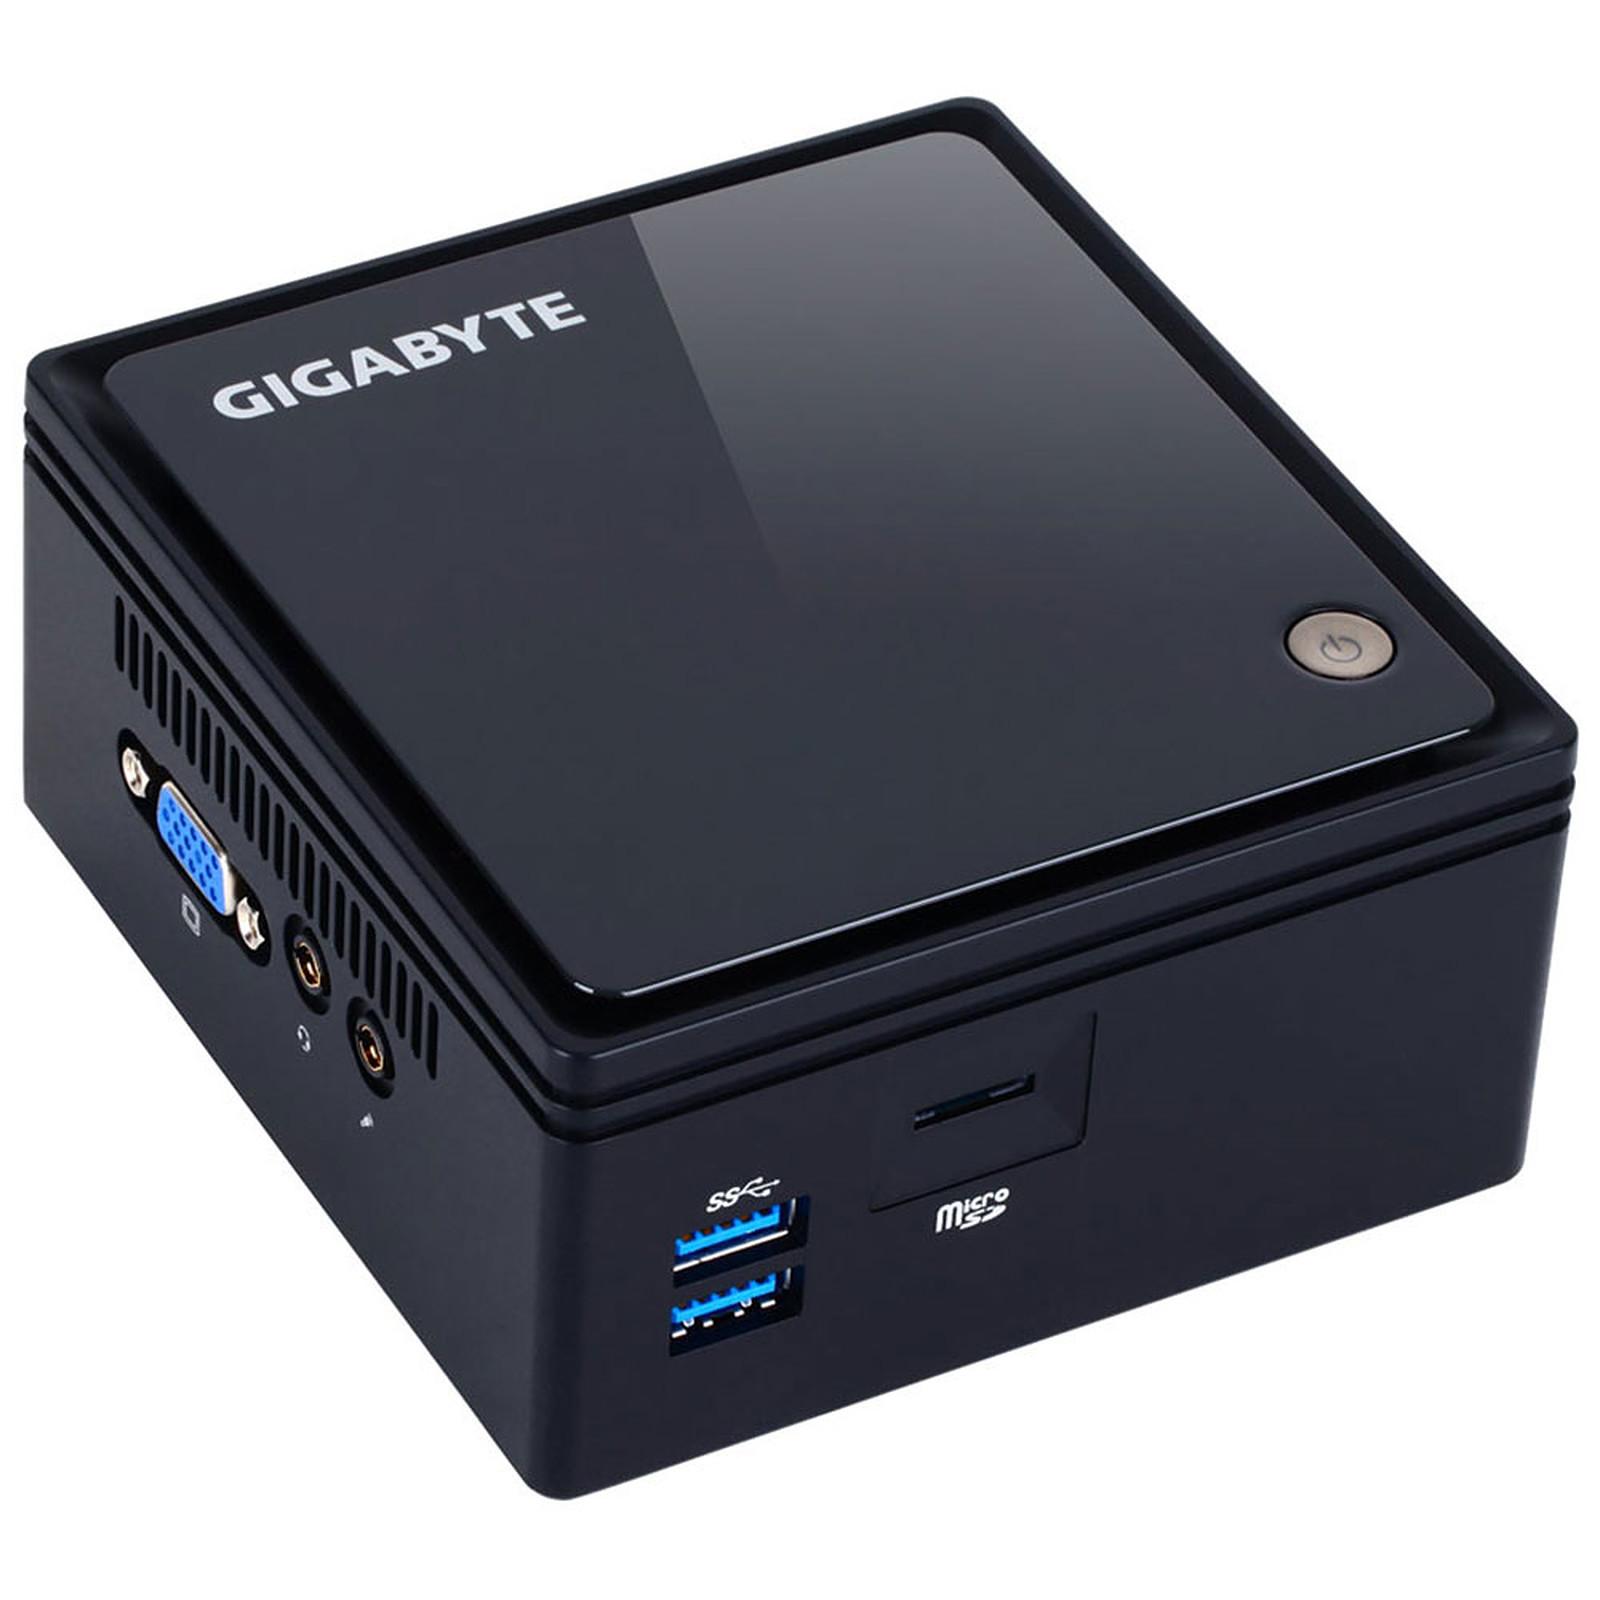 Gigabyte Brix GB-BACE-3150